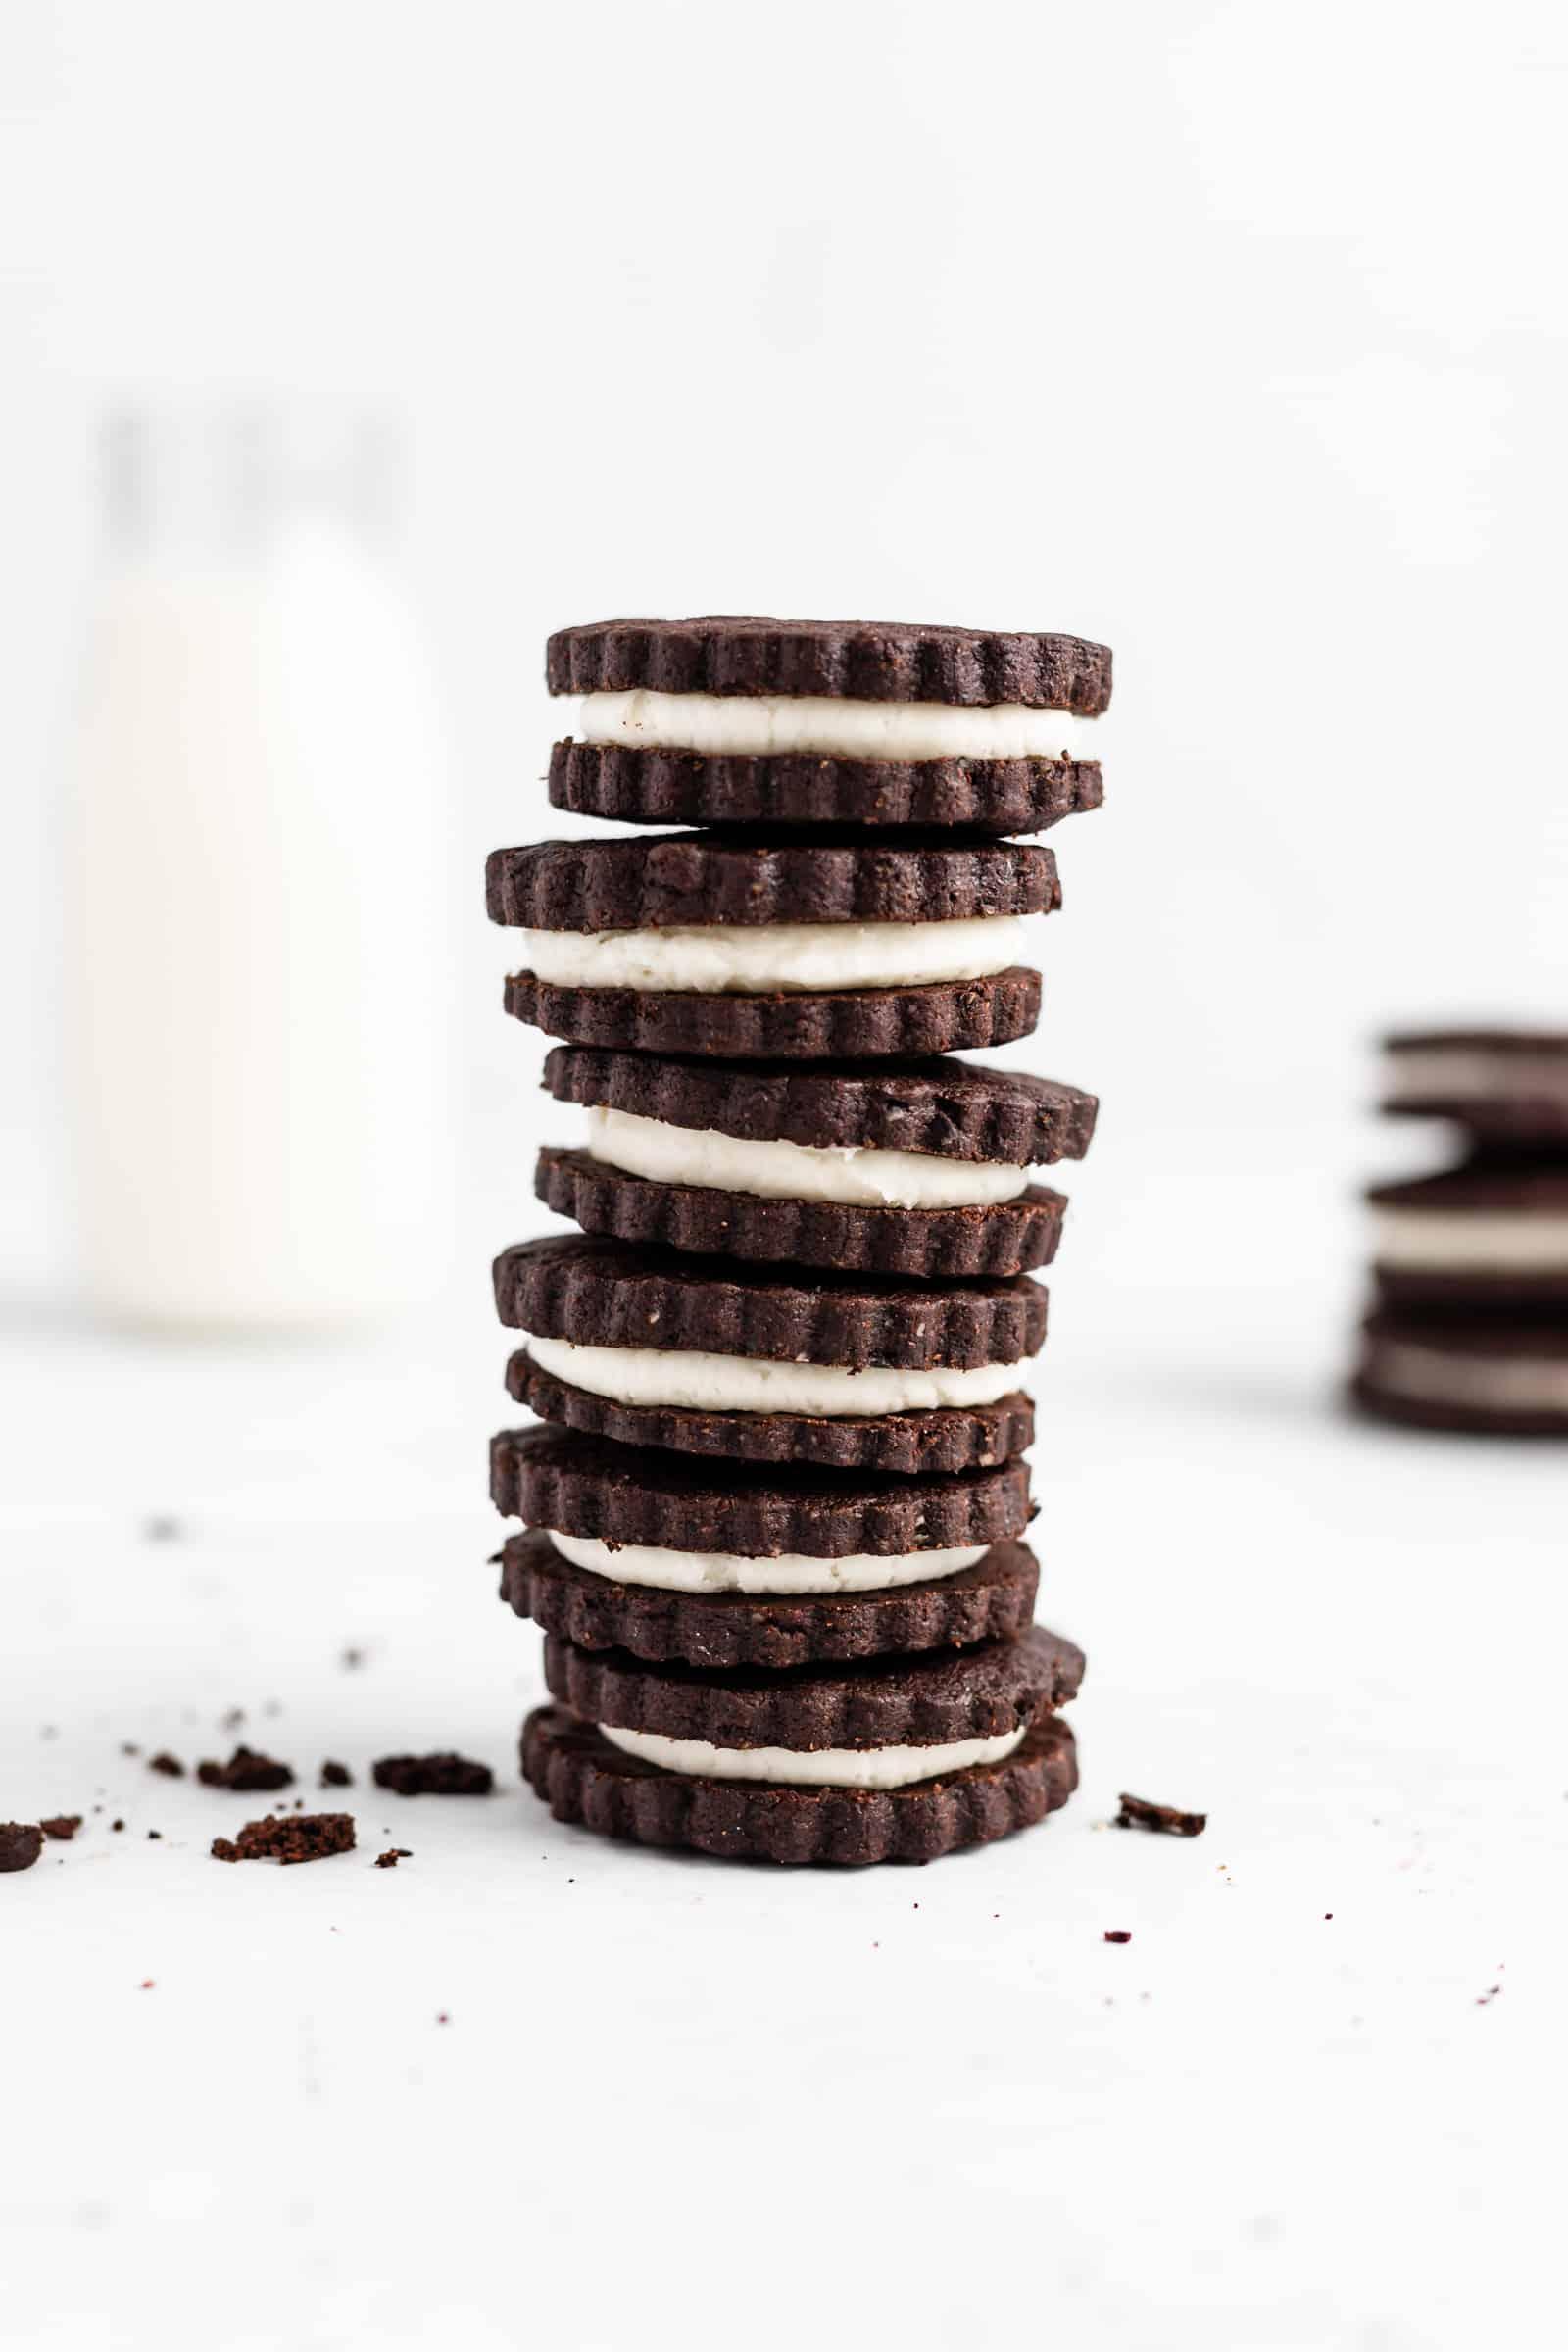 Homemade Oreo Cookies (Cream Filled Chocolate Sandwich Cookies)